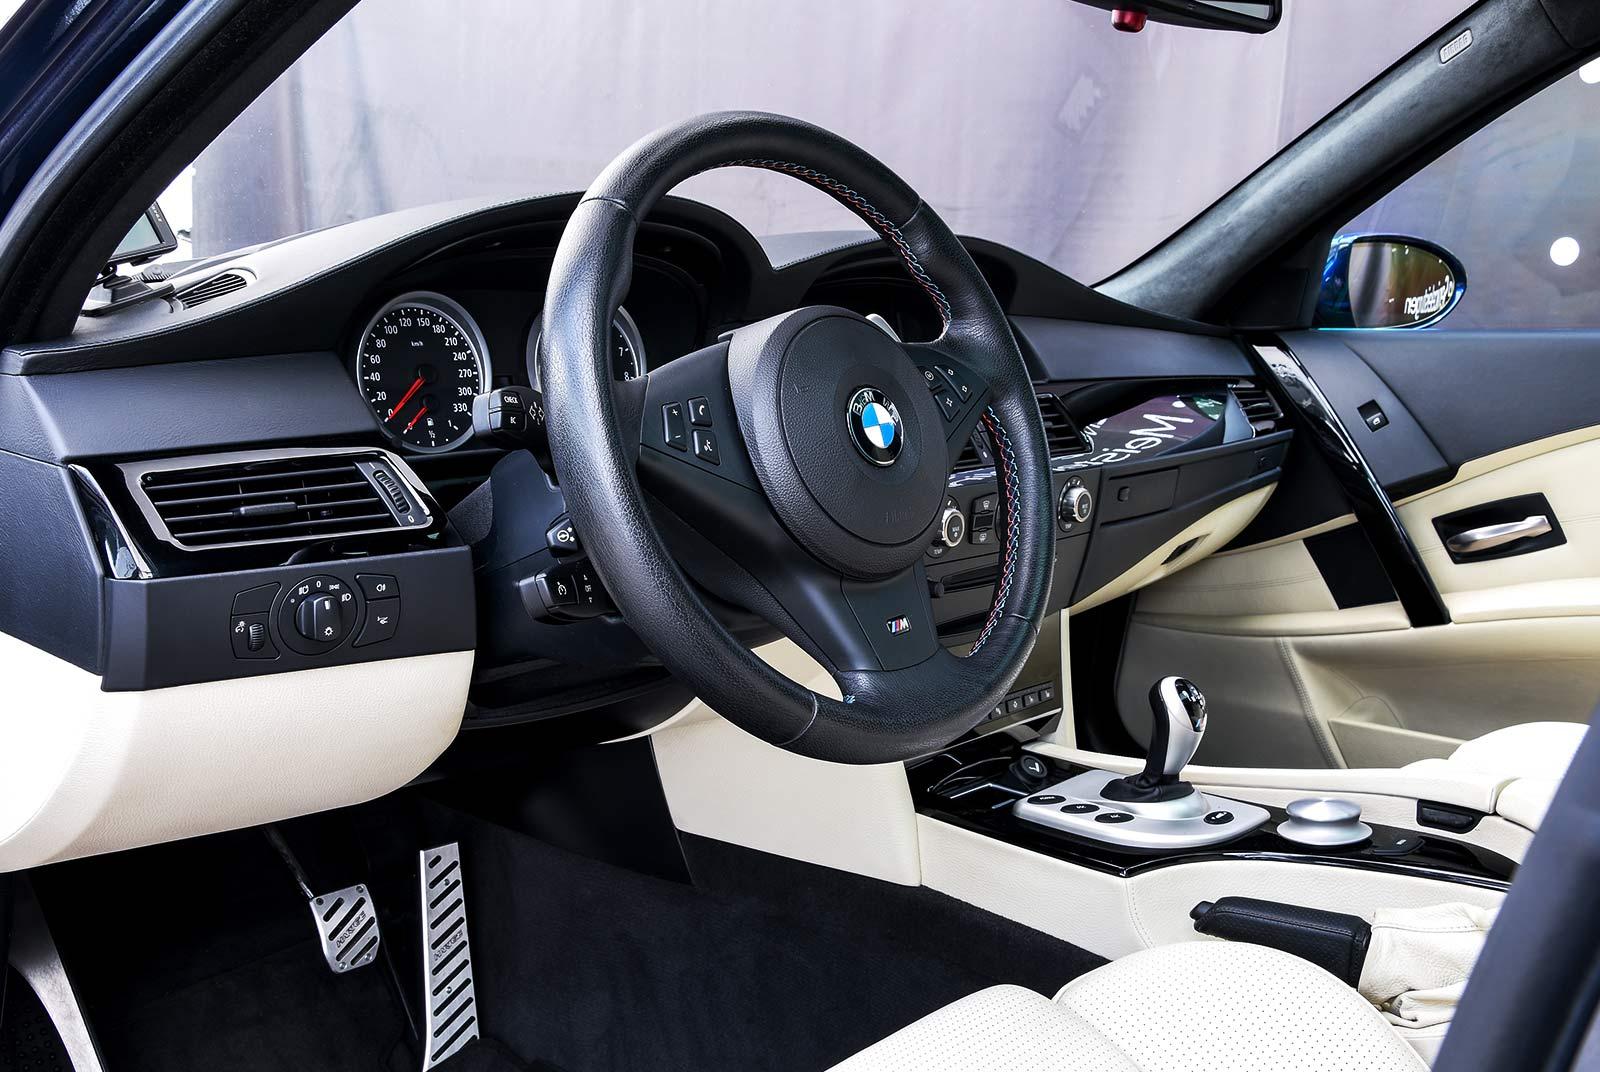 11bmw_m_5_blaulila_creme_BMW-2353_09